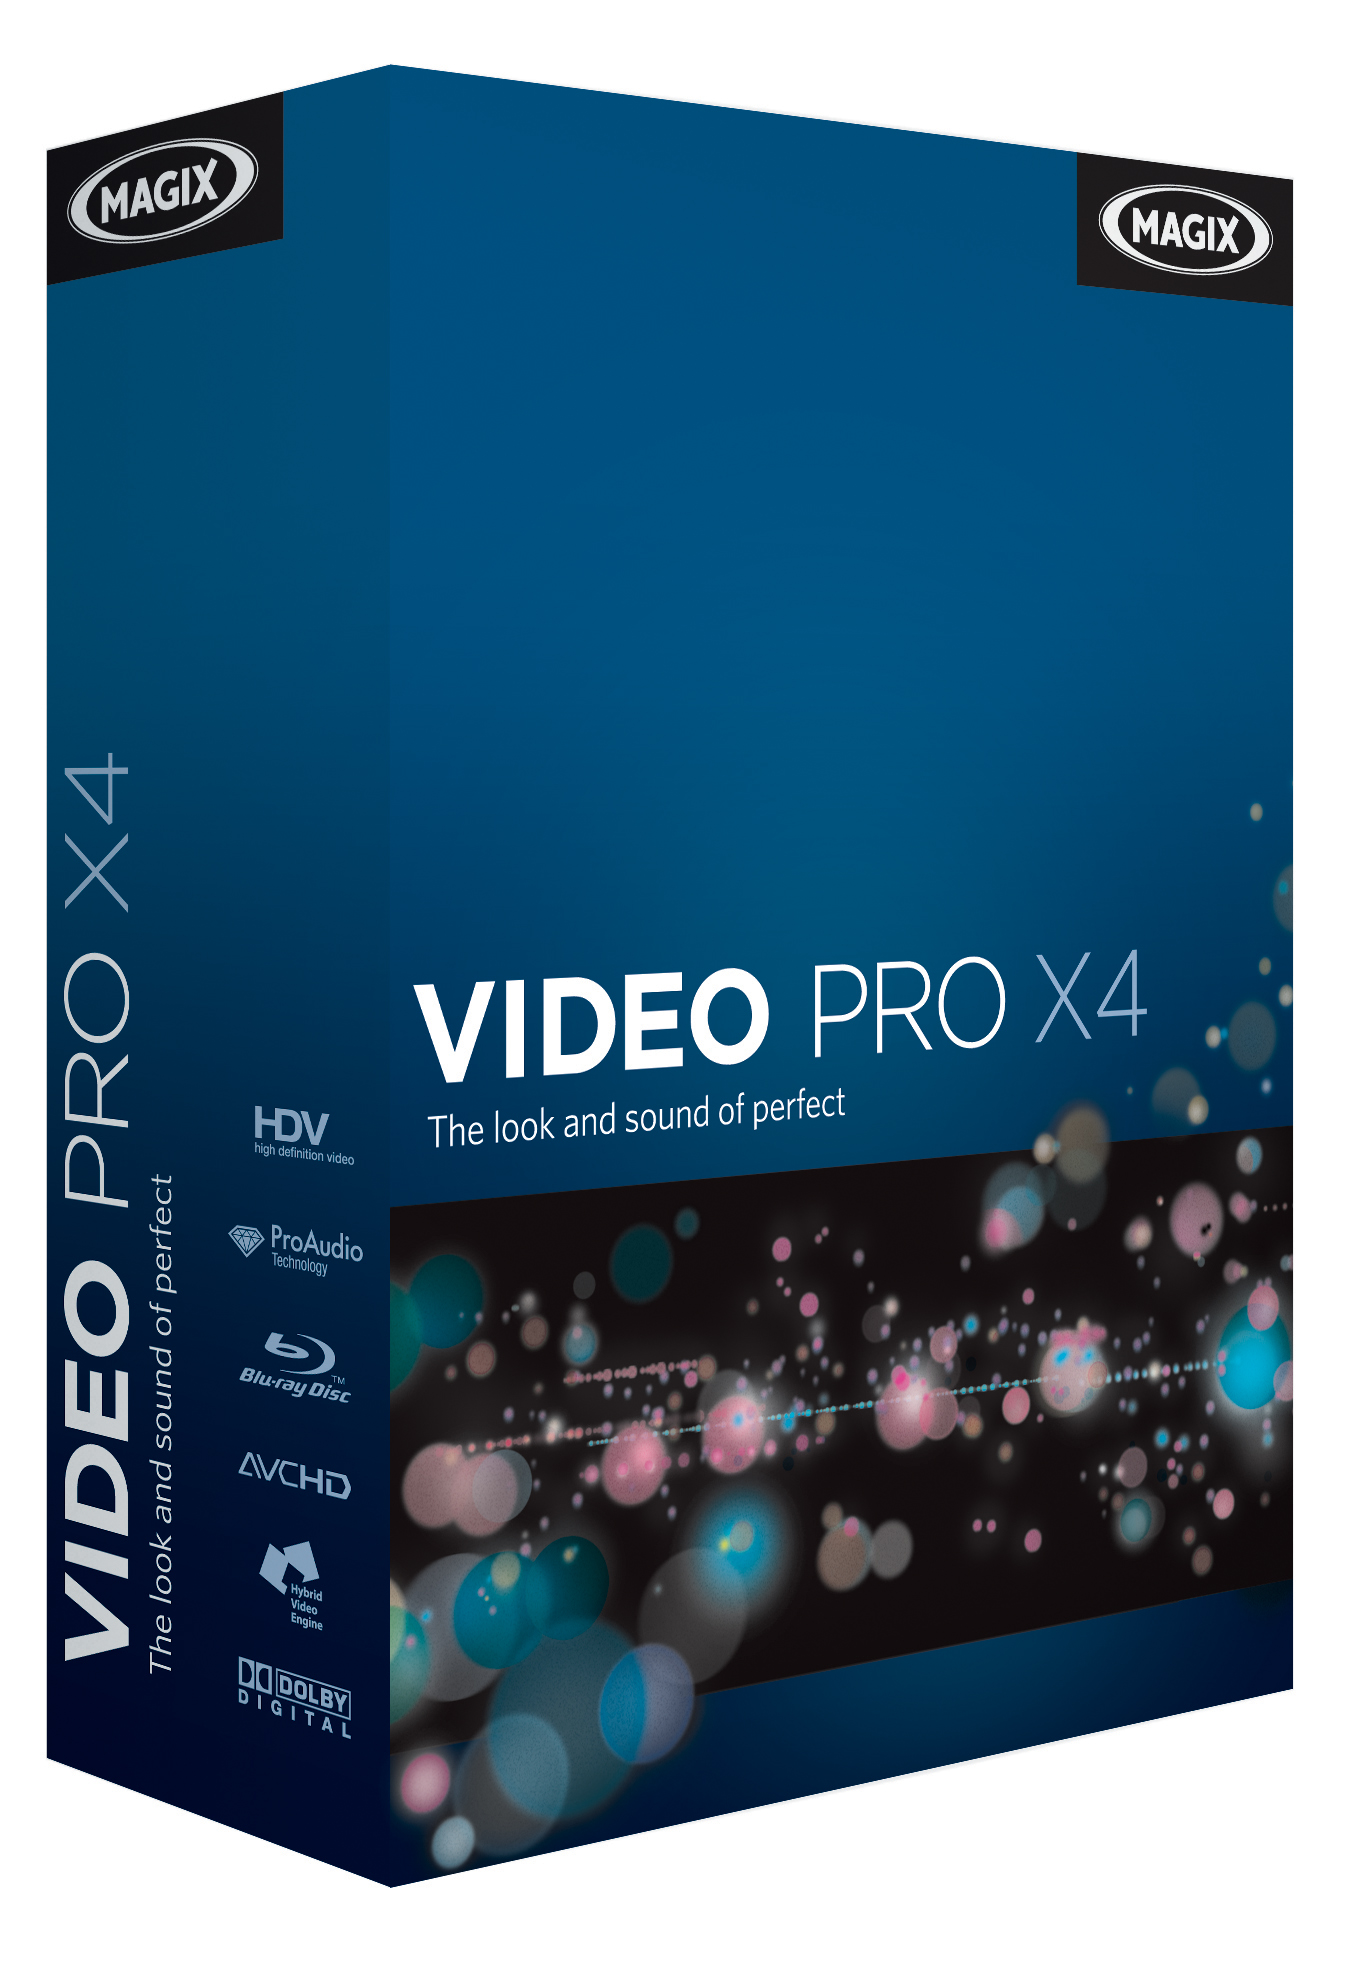 Index of /magix/Pro Products/Video_Pro_X4/Packshots/rgb